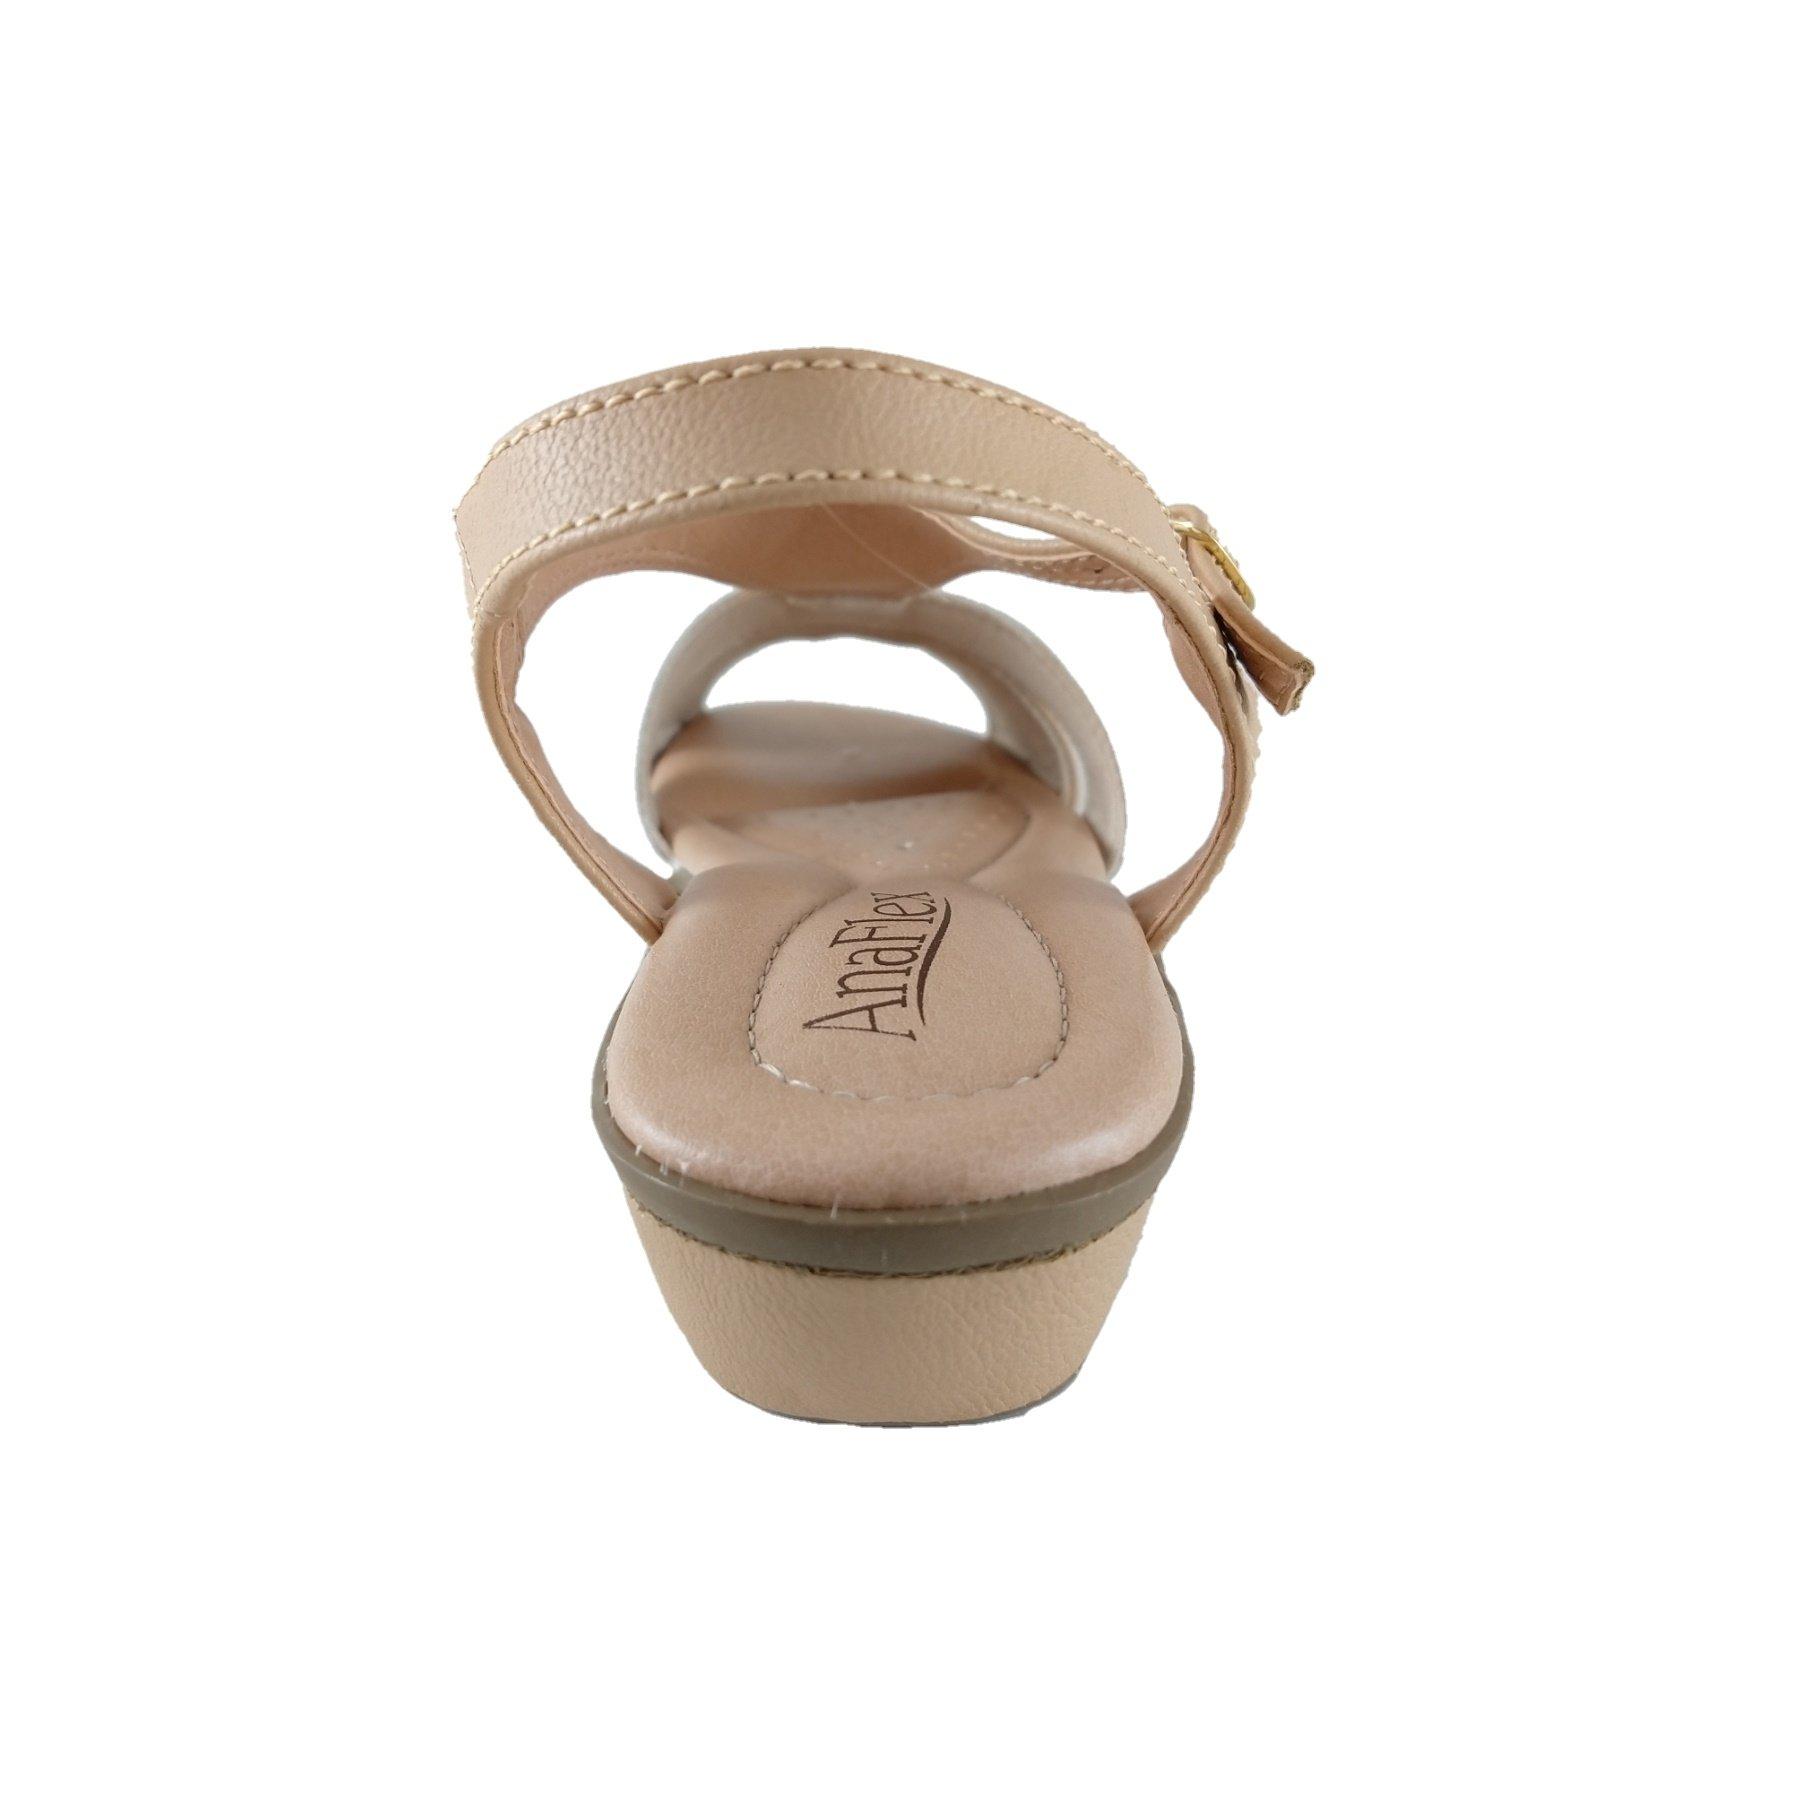 Sandália Confort SapatoWeb Flex Bege  - SAPATOWEB.COM